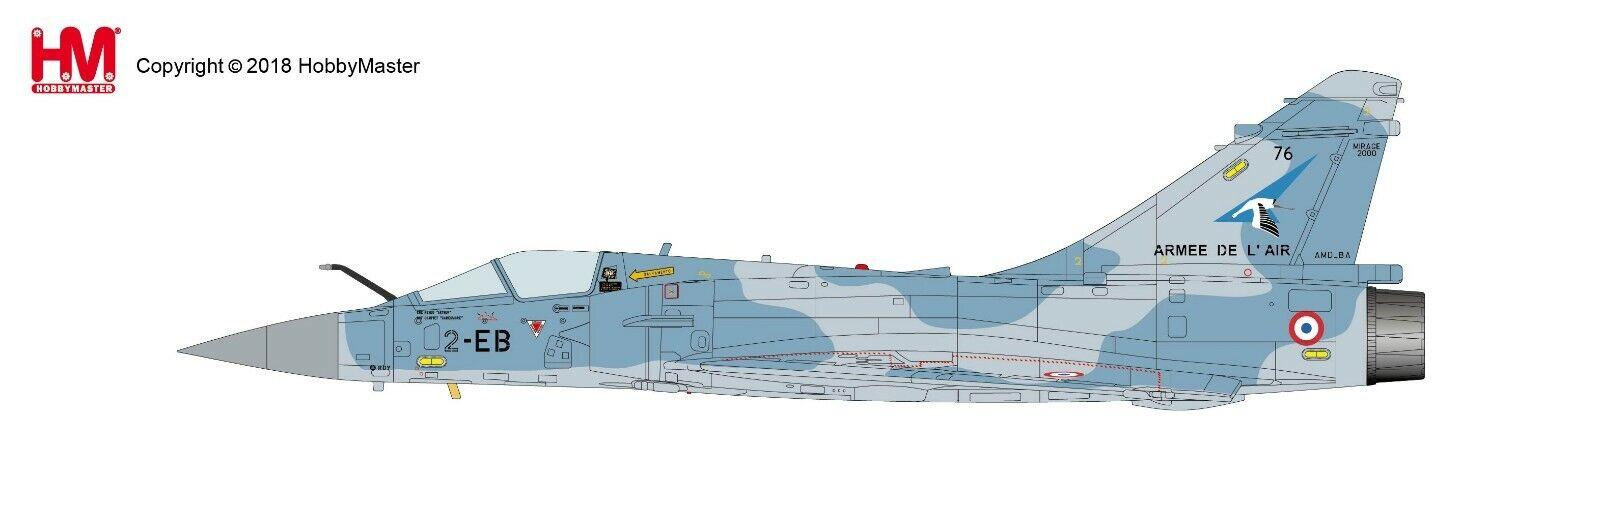 Hobby Master HA1614, Mirage 2000-5F 2-EB, 1 2, 3 103, E.C. Cigognes, Dijon Spa,